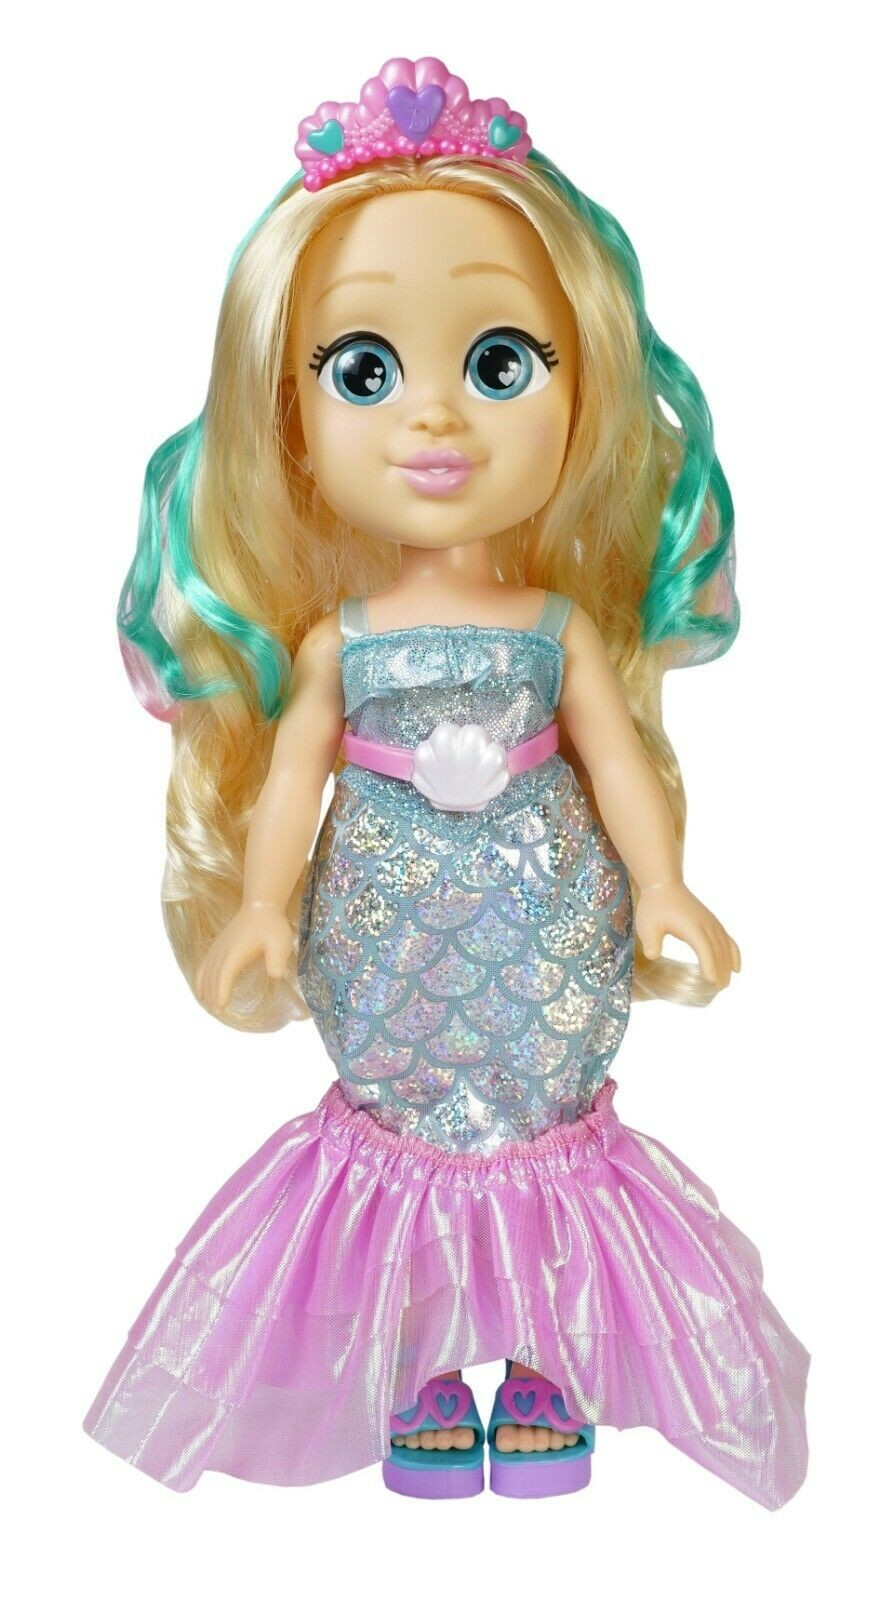 Love Diana - Doll Mashup Party/Mermaid 33cm (20081)